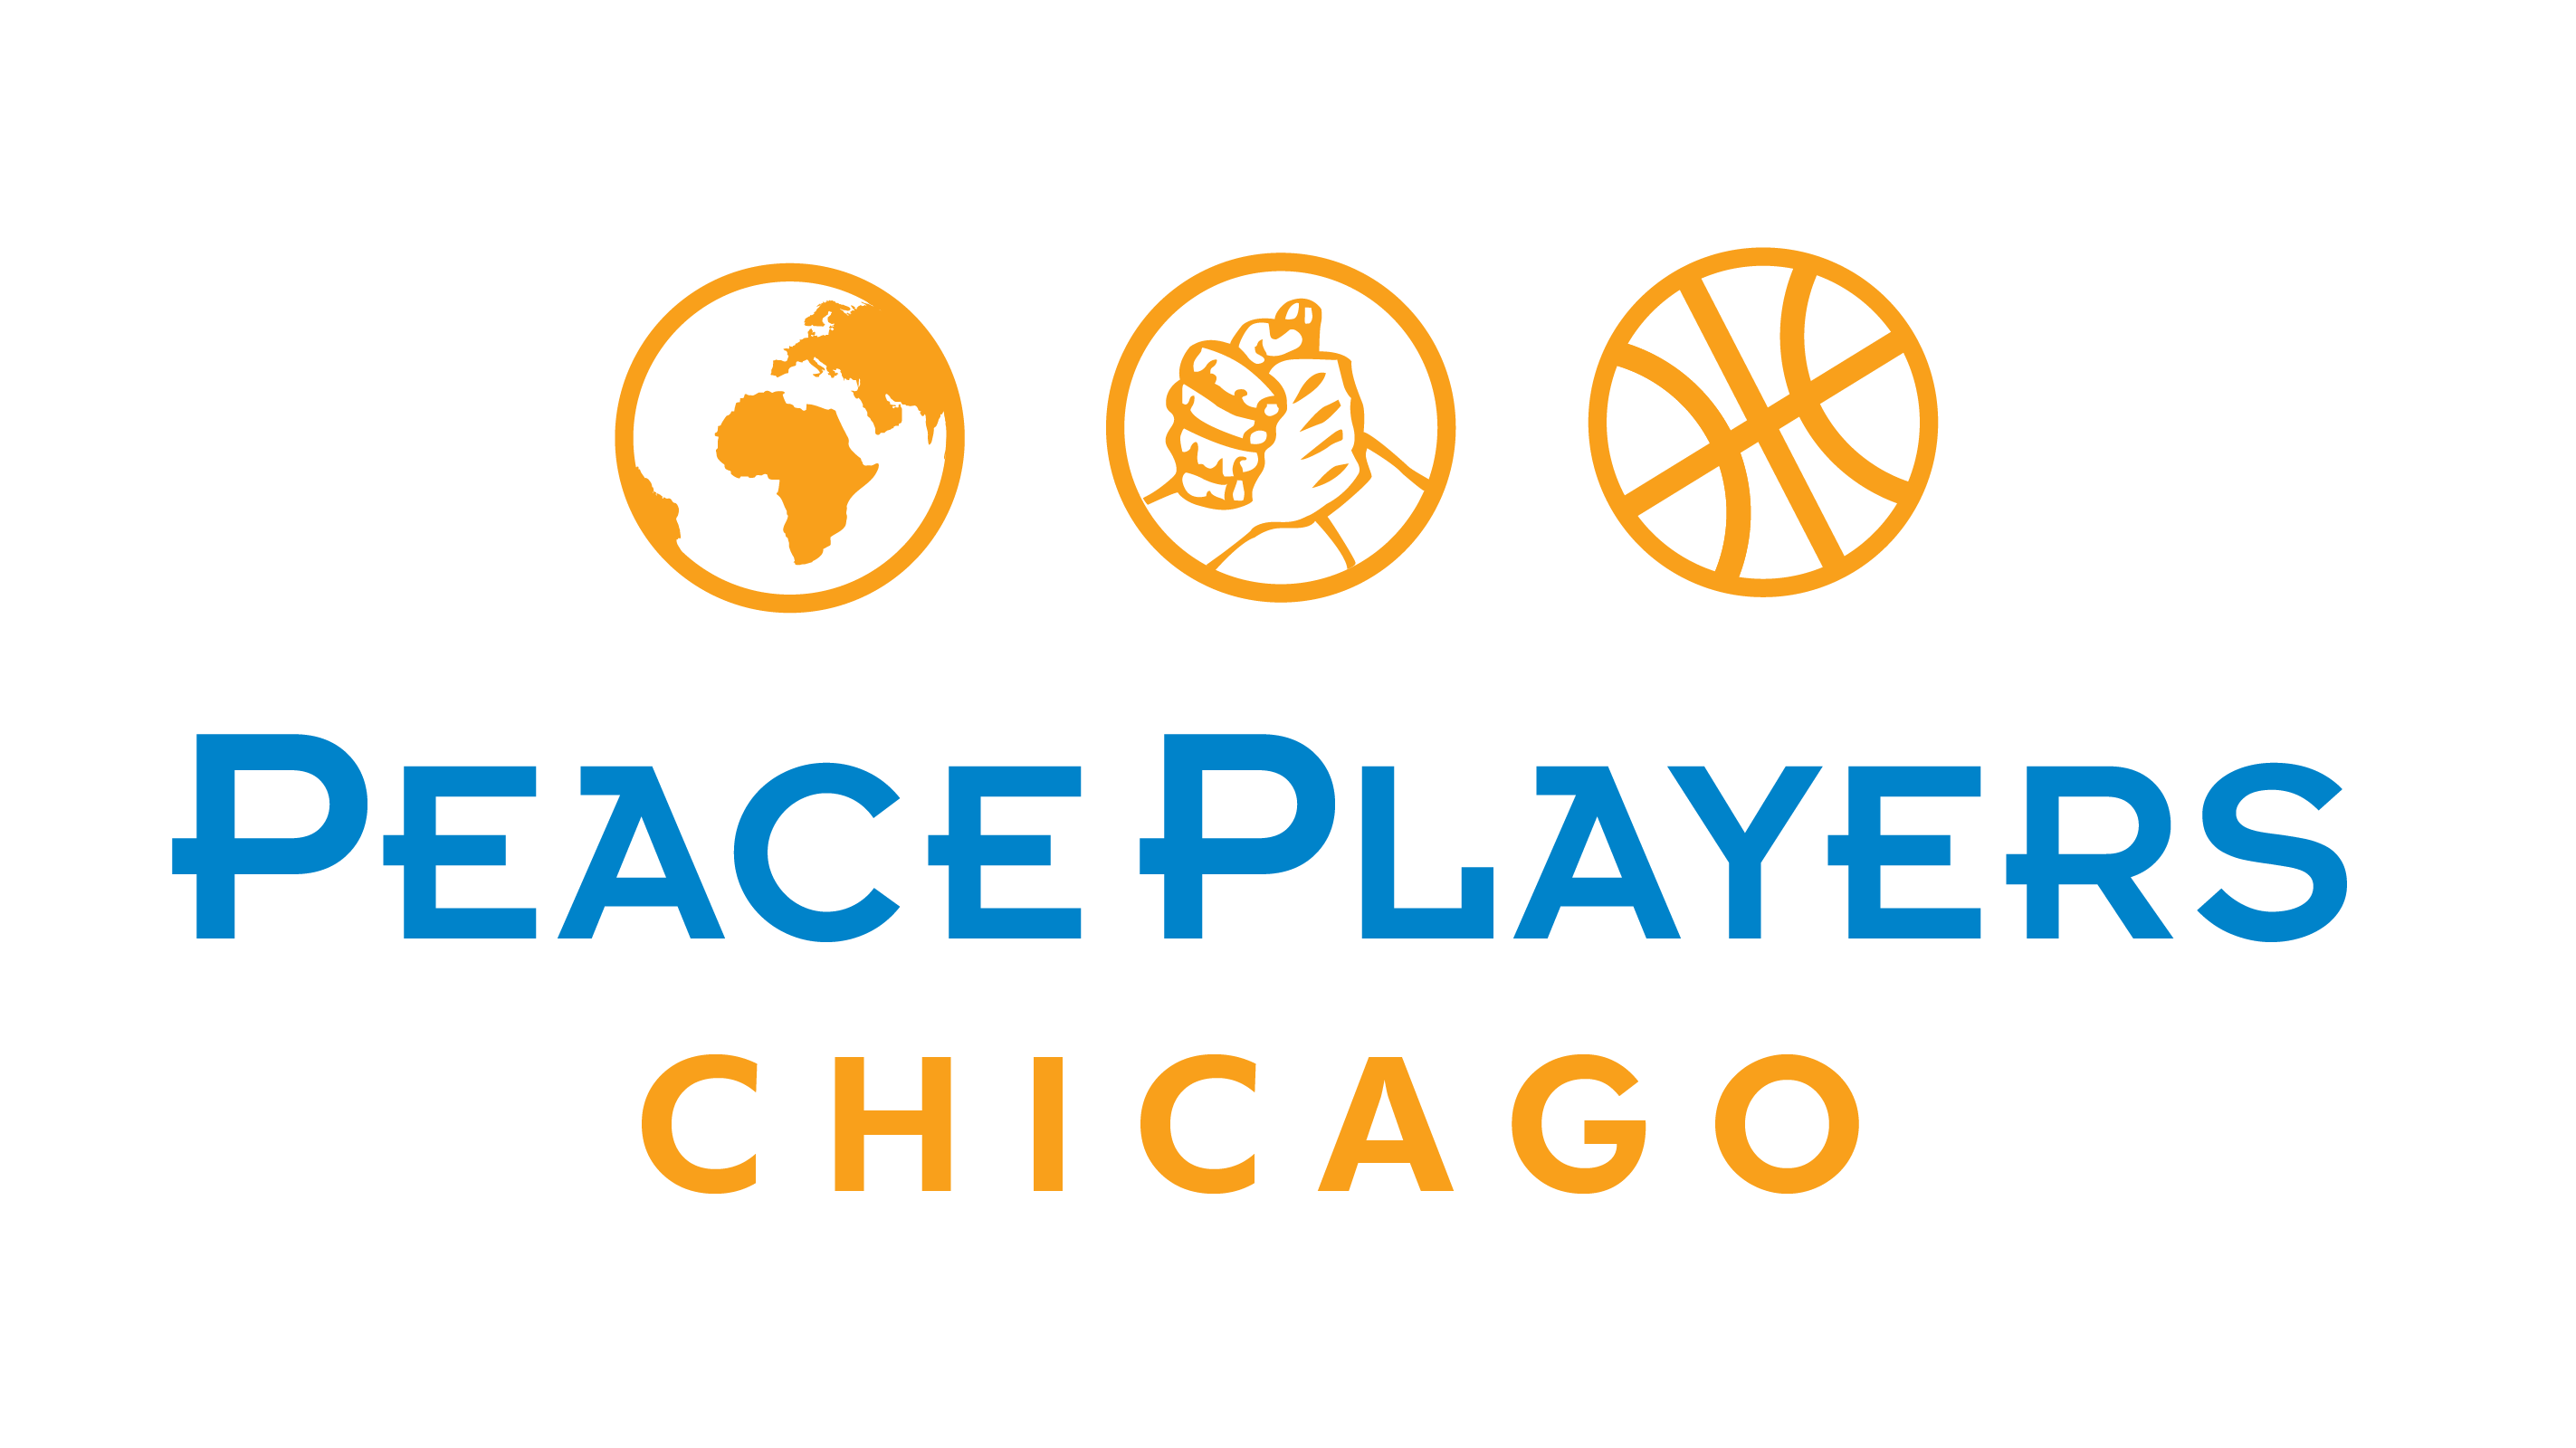 PeacePlayers Chicago Logo